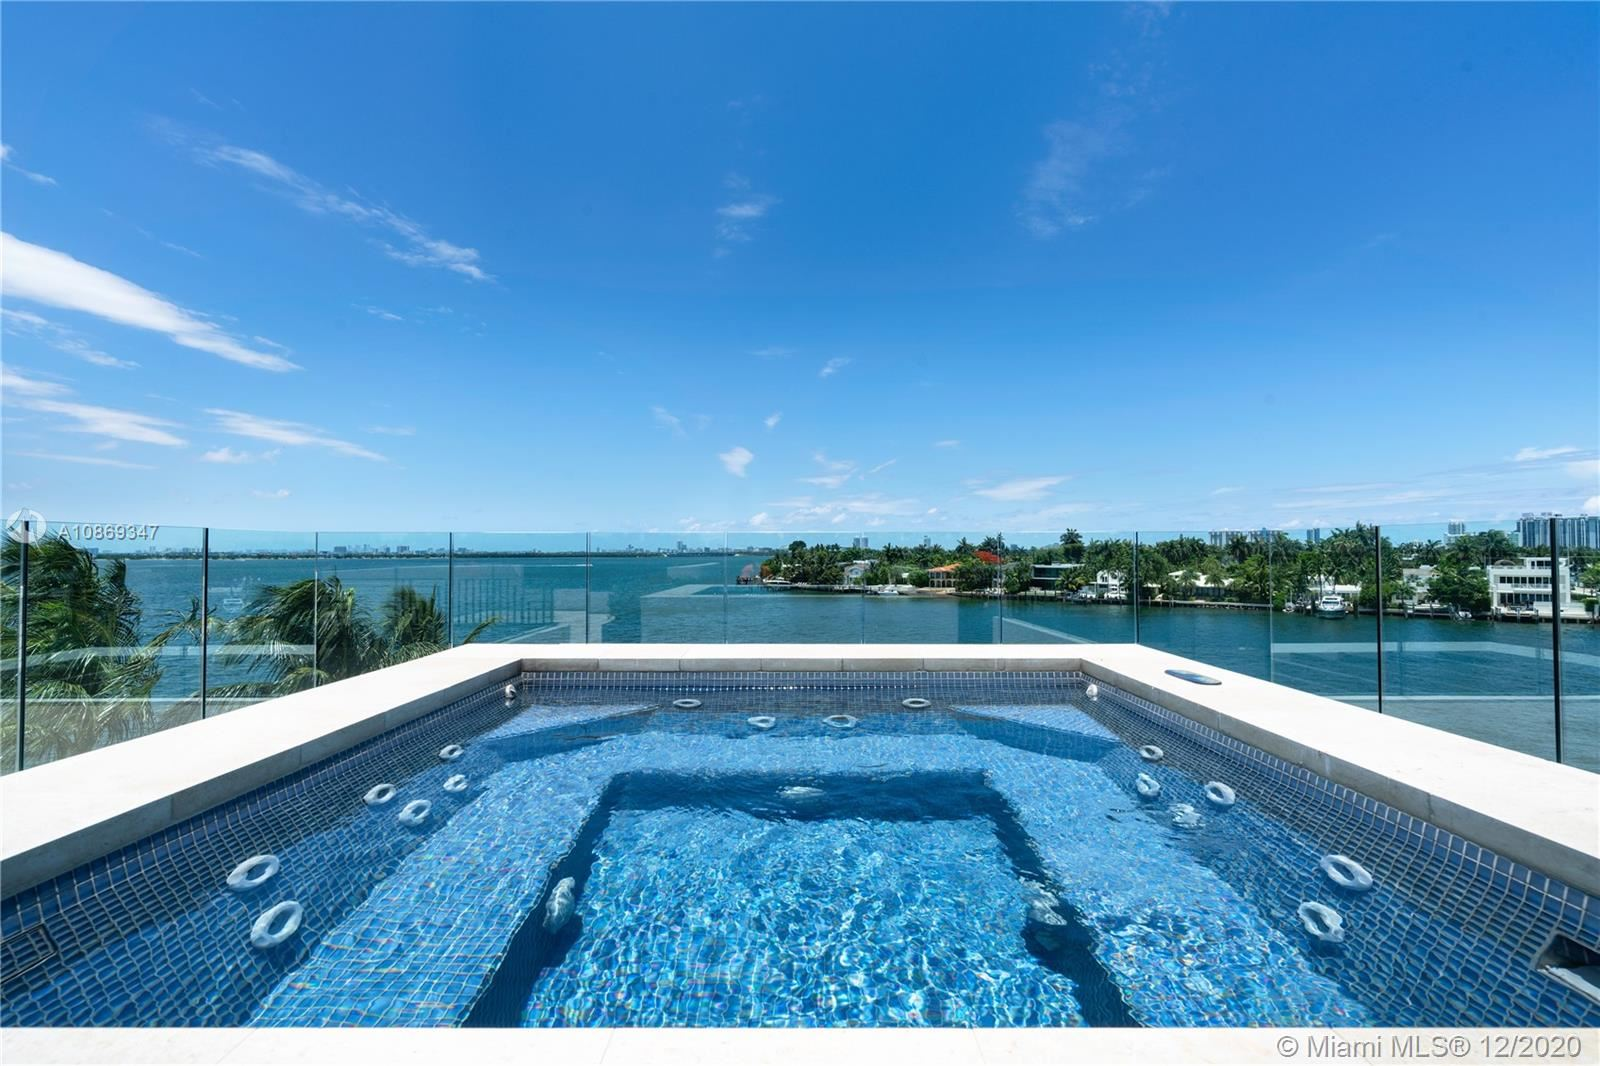 Photo 9 of Listing MLS a10869347 in 1429 N Venetian Way Miami FL 33139